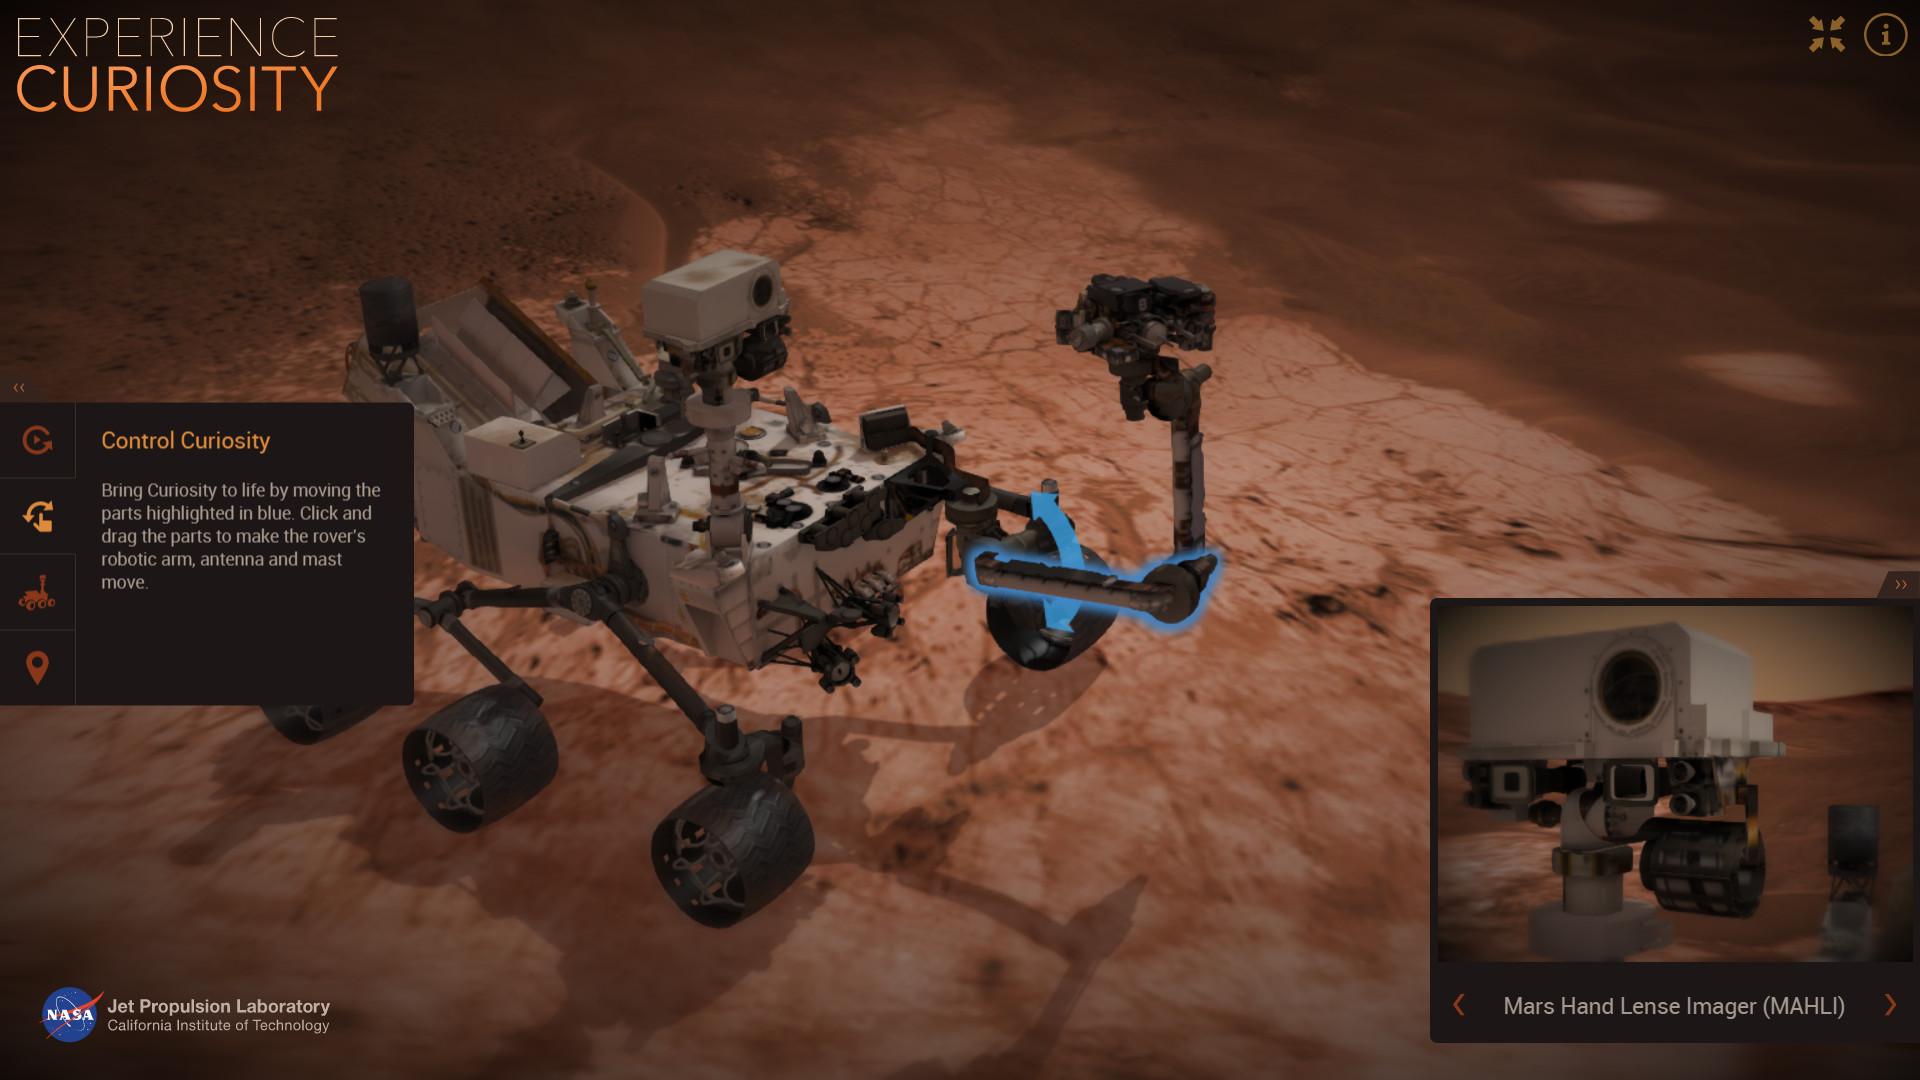 NASA_ExperienceCuriosity2